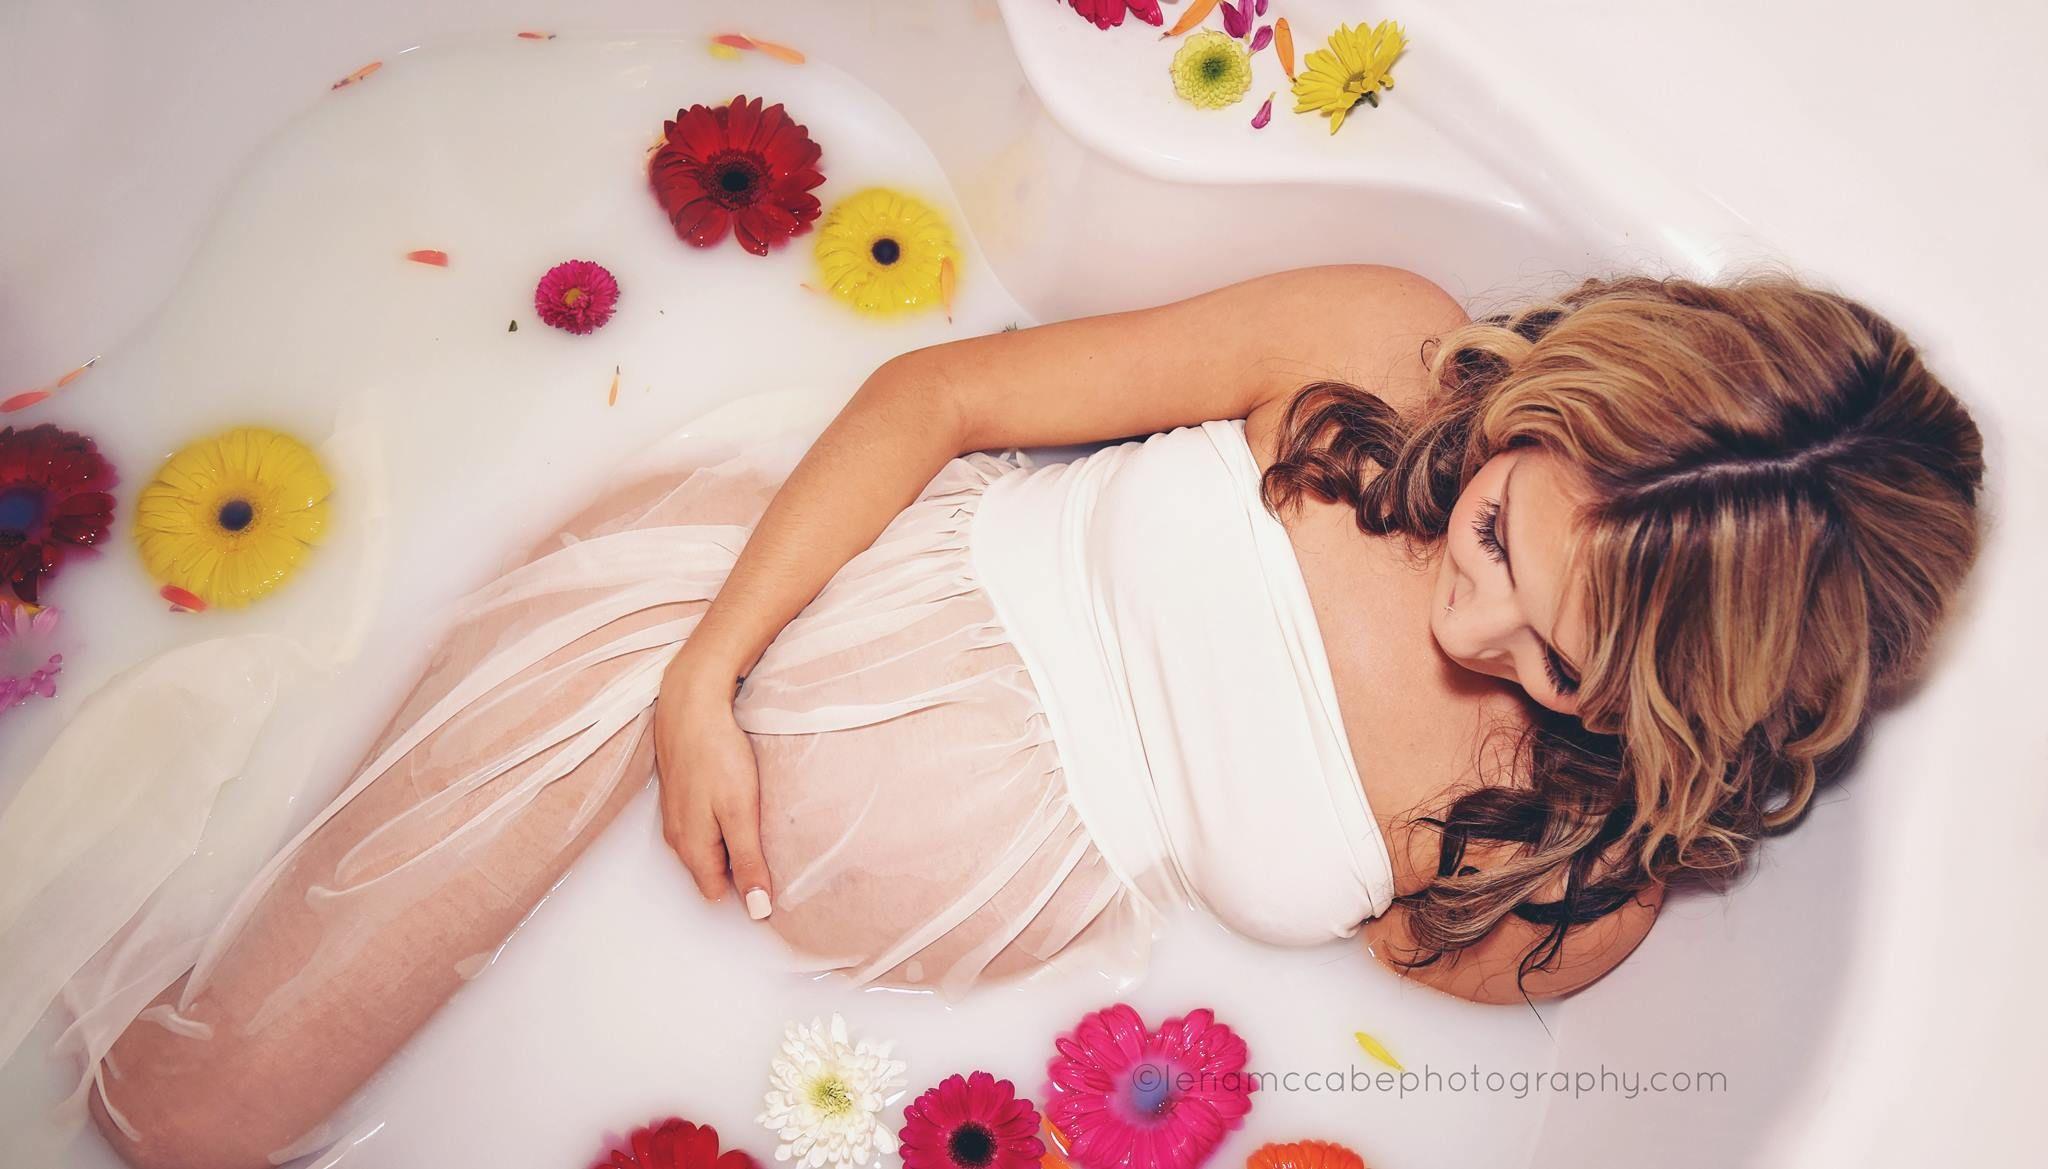 milk-bath-photography-photo-retouching-sample